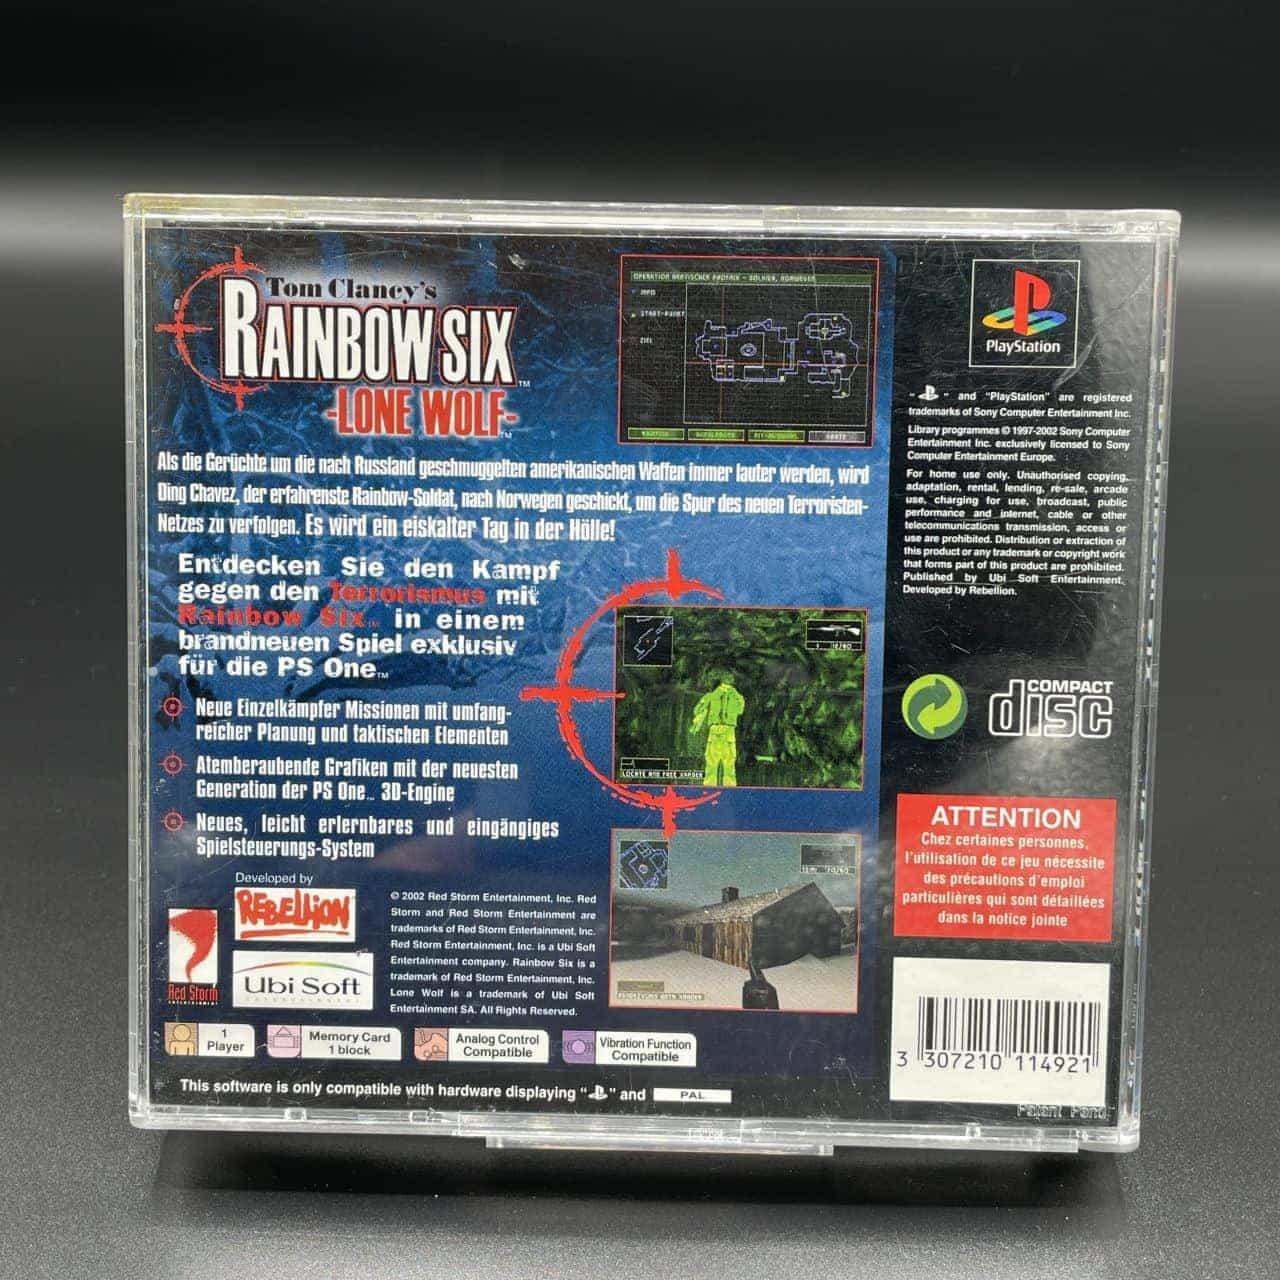 PS1 Rainbow Six: Lone Wolf, Tom Clancy's (Komplett) (Gebrauchsspuren) Sony PlayStation 1